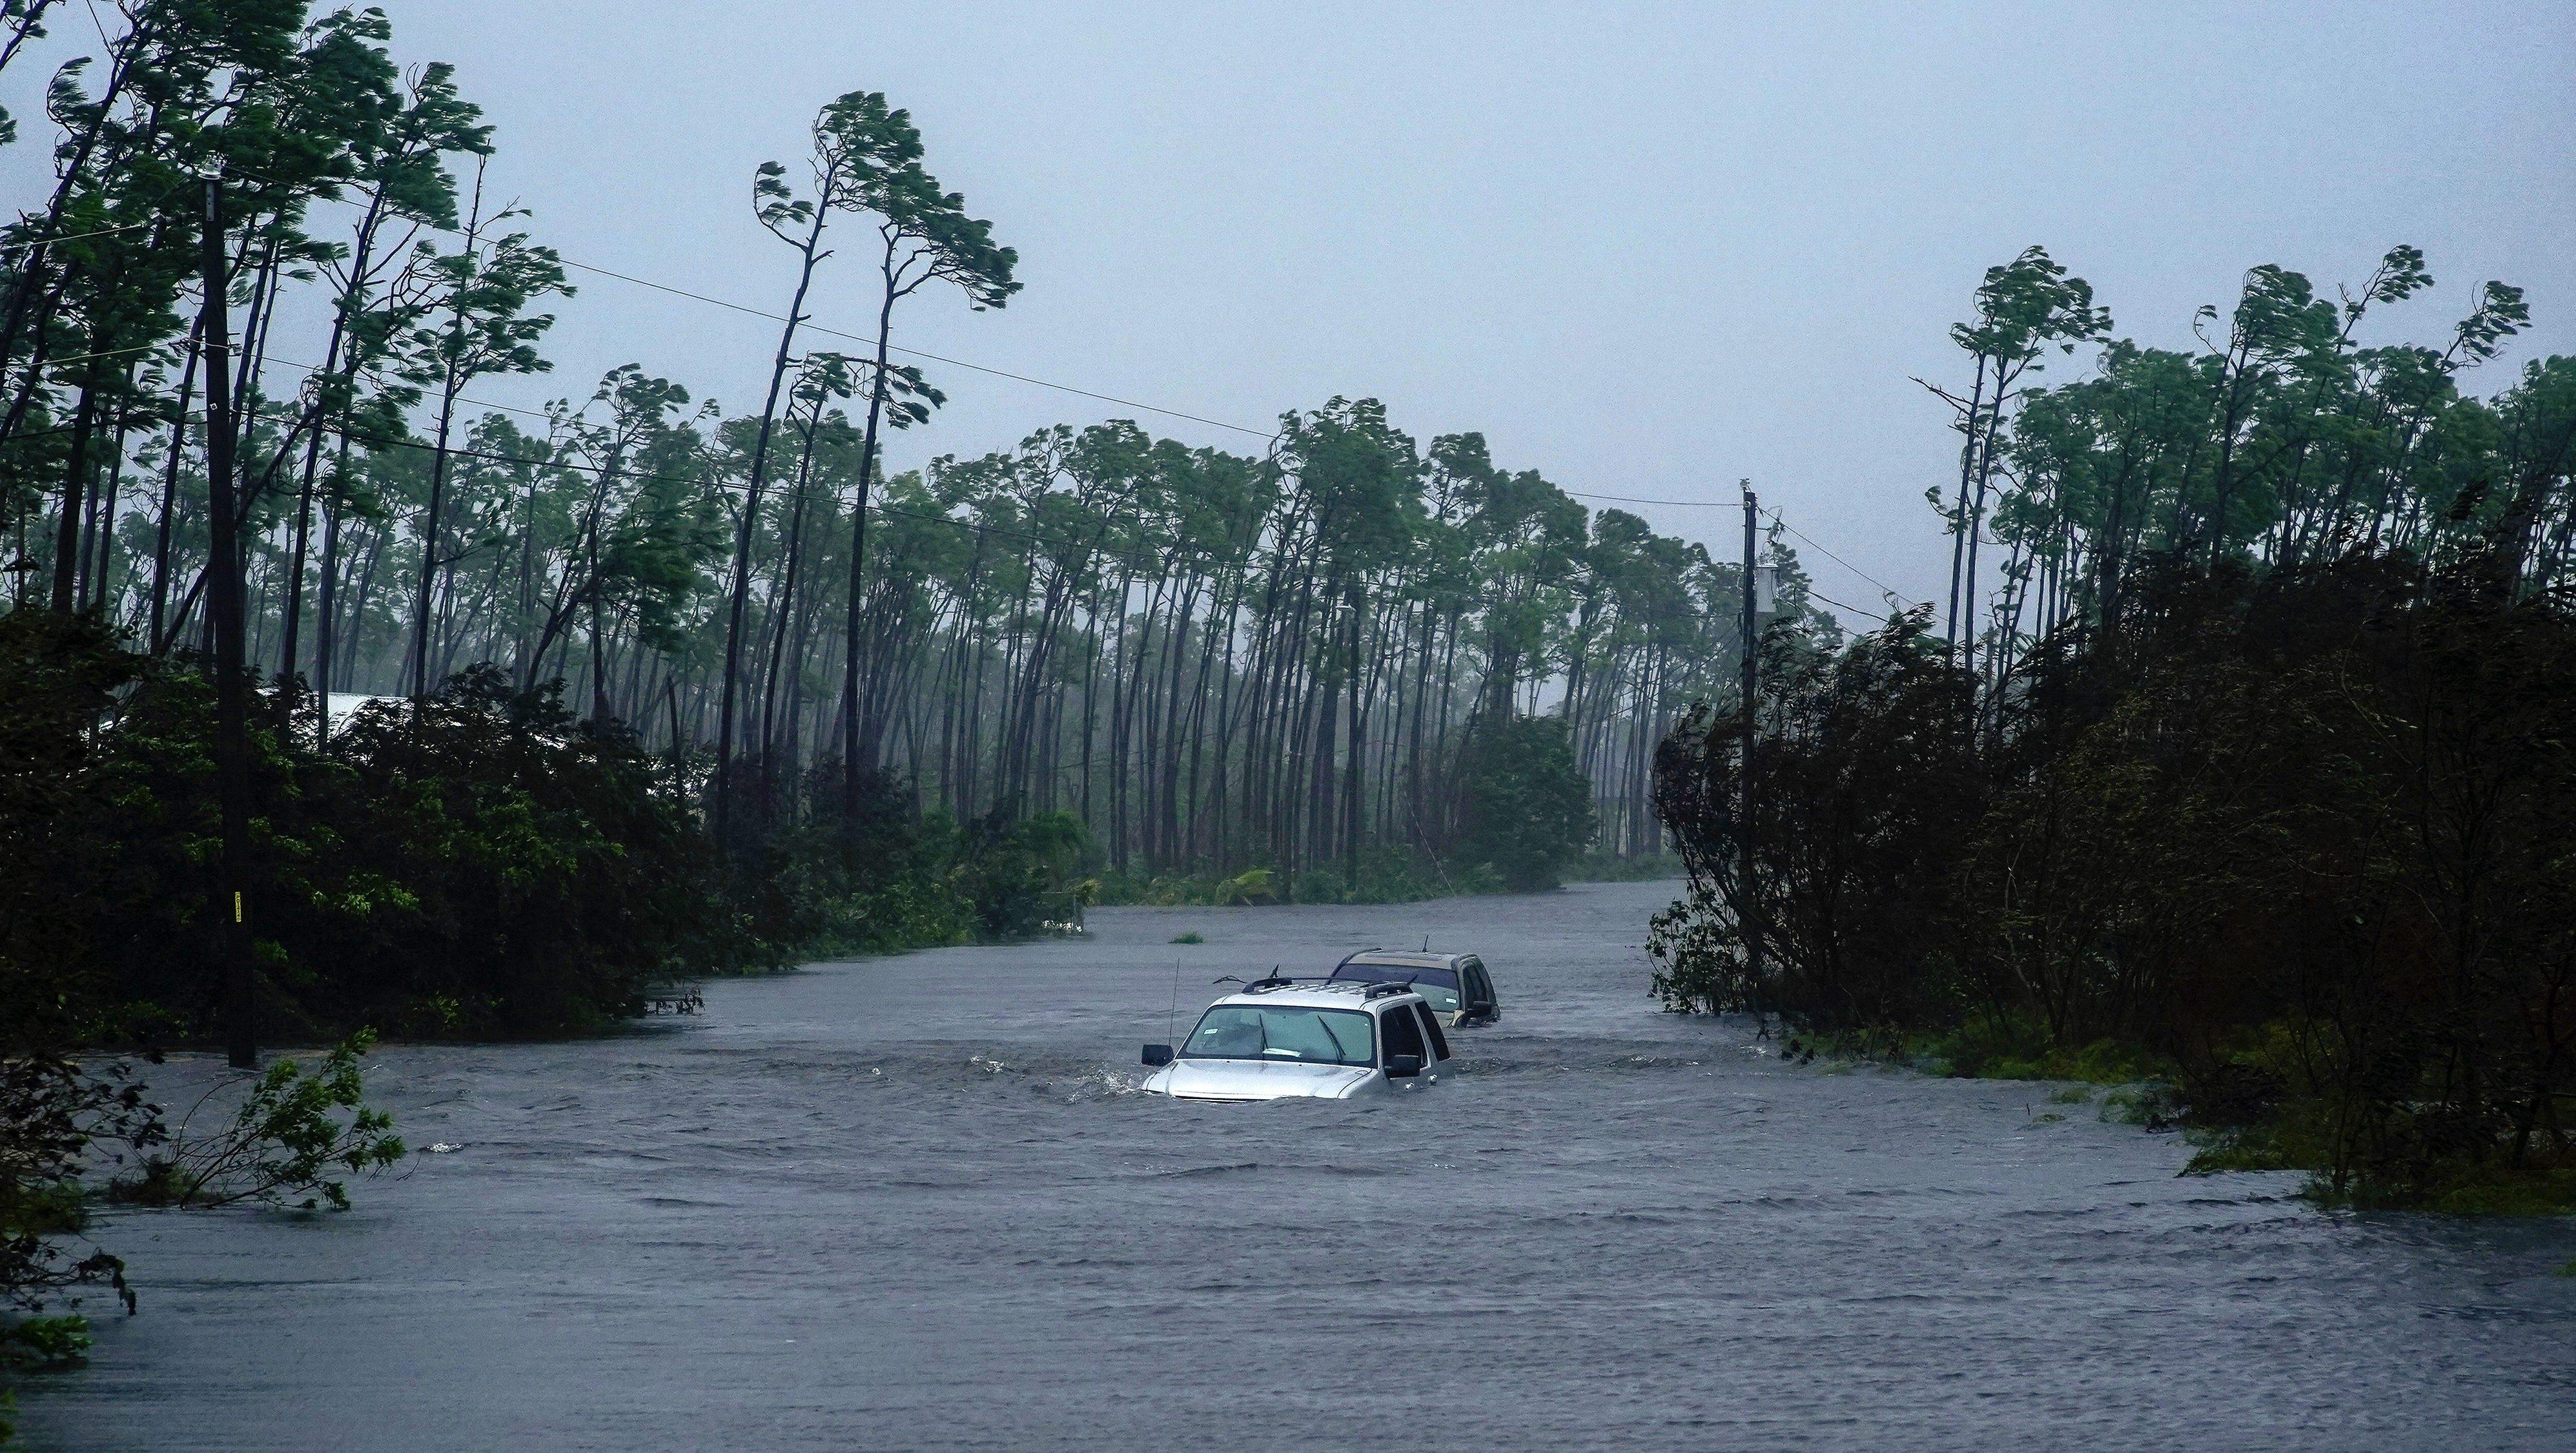 Submerged cars in Freeport, Bahamas on Sept. 3.